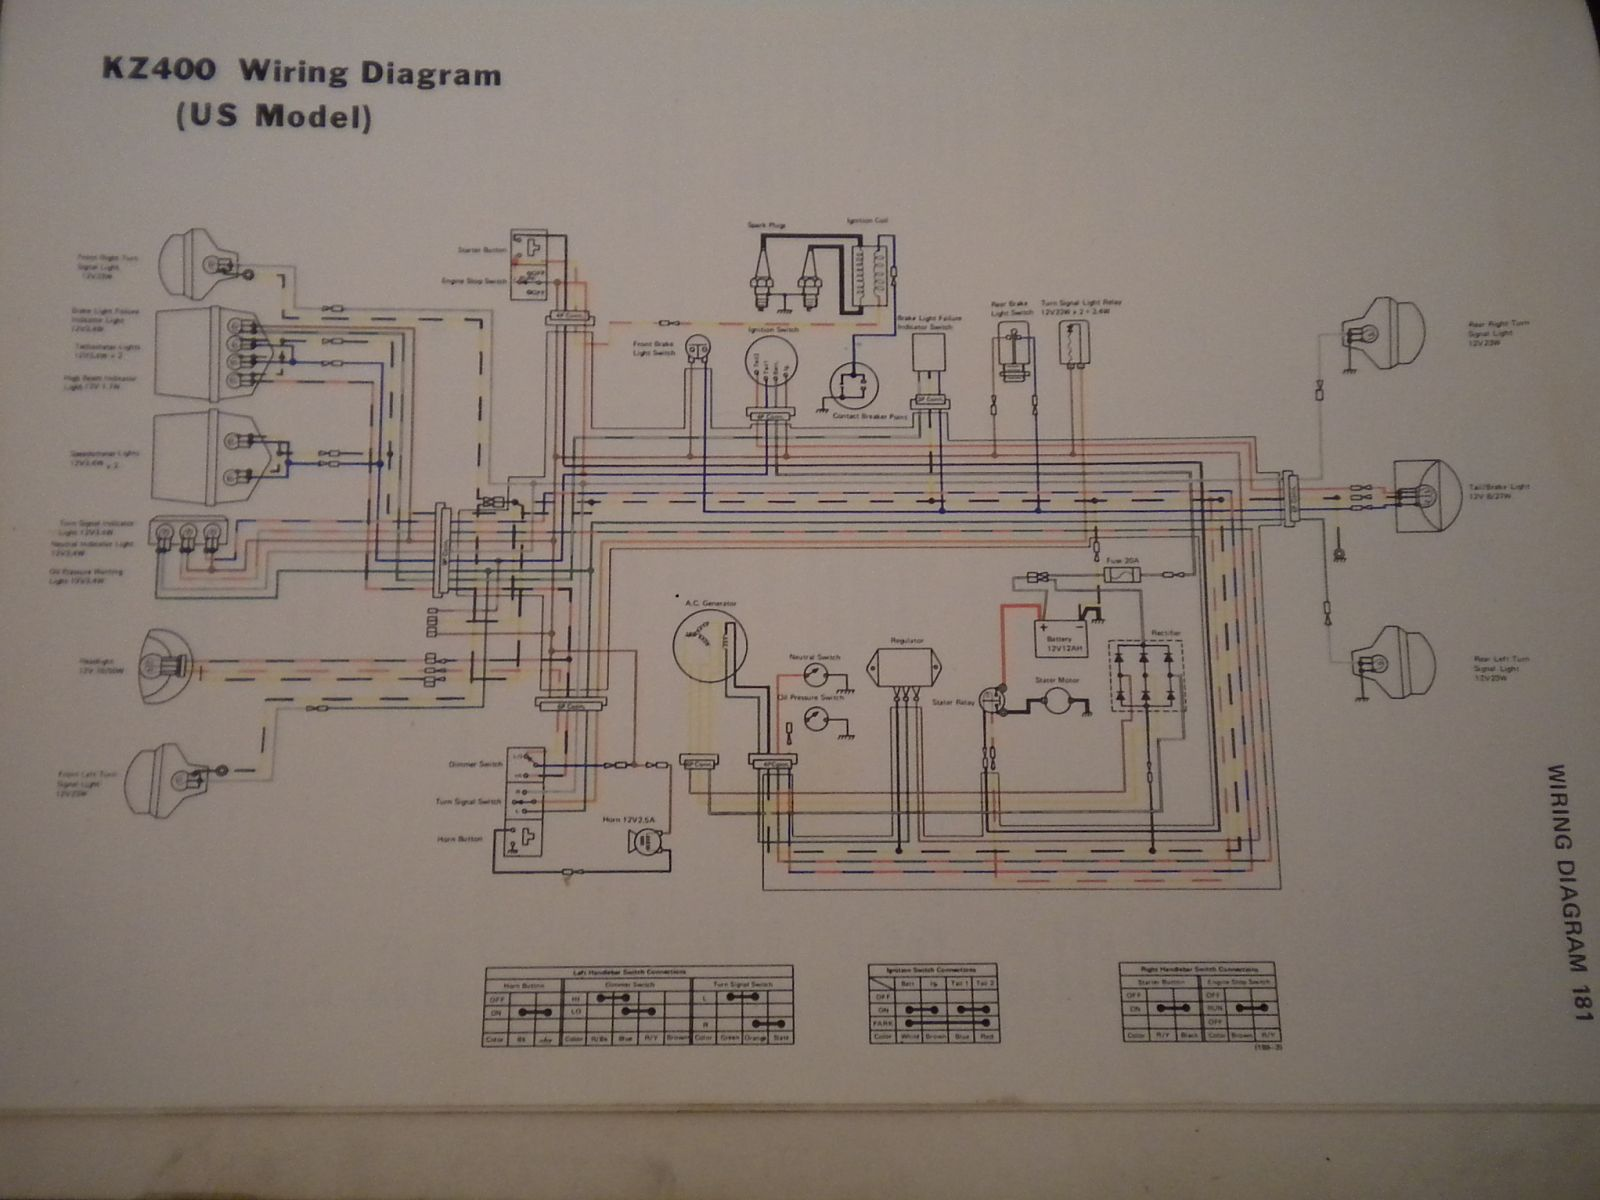 1981 cb750 wiring diagram slug anatomy 81 kz440 get free image about